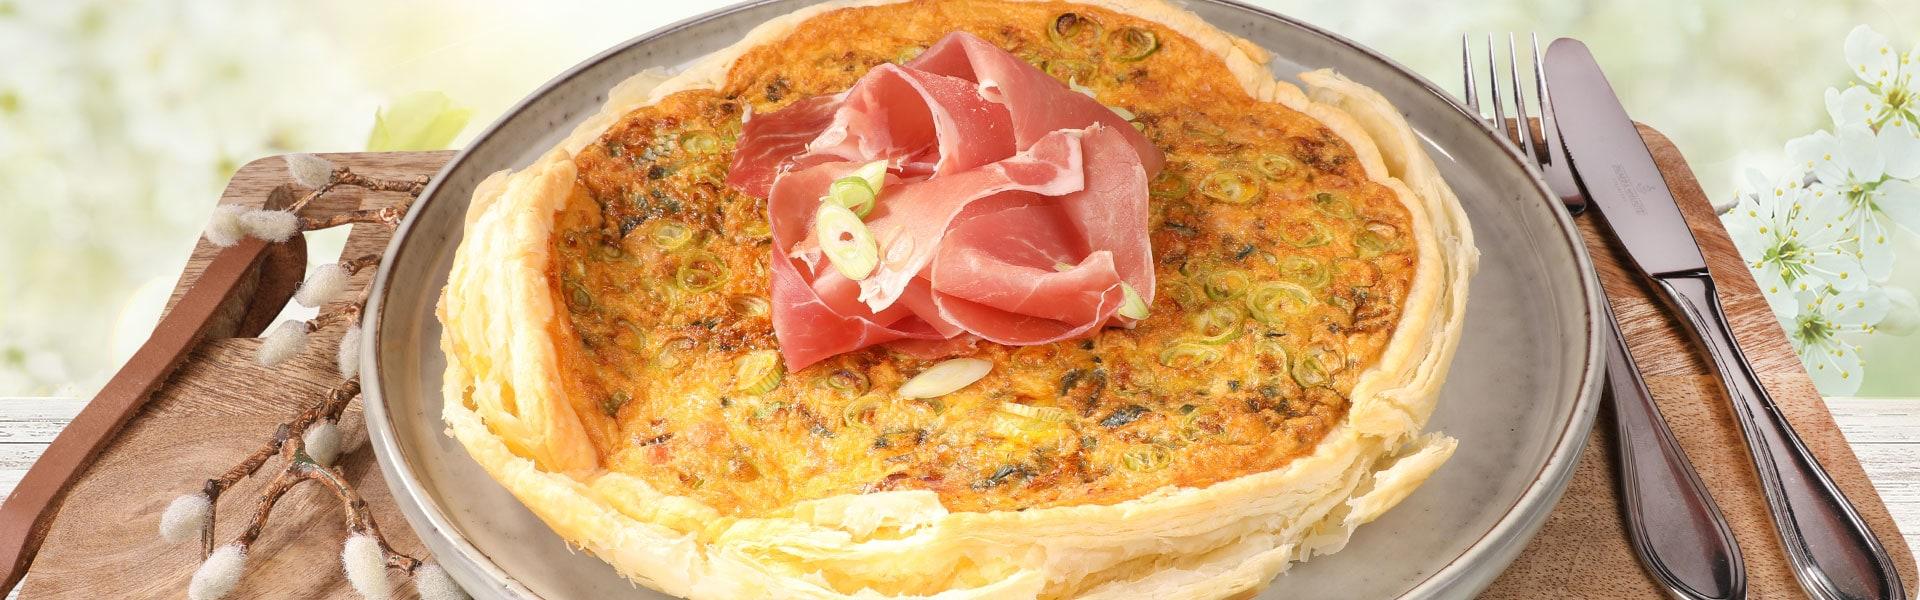 Frühstücks Quiche – Hollands Gourmet Service Osterrezepte